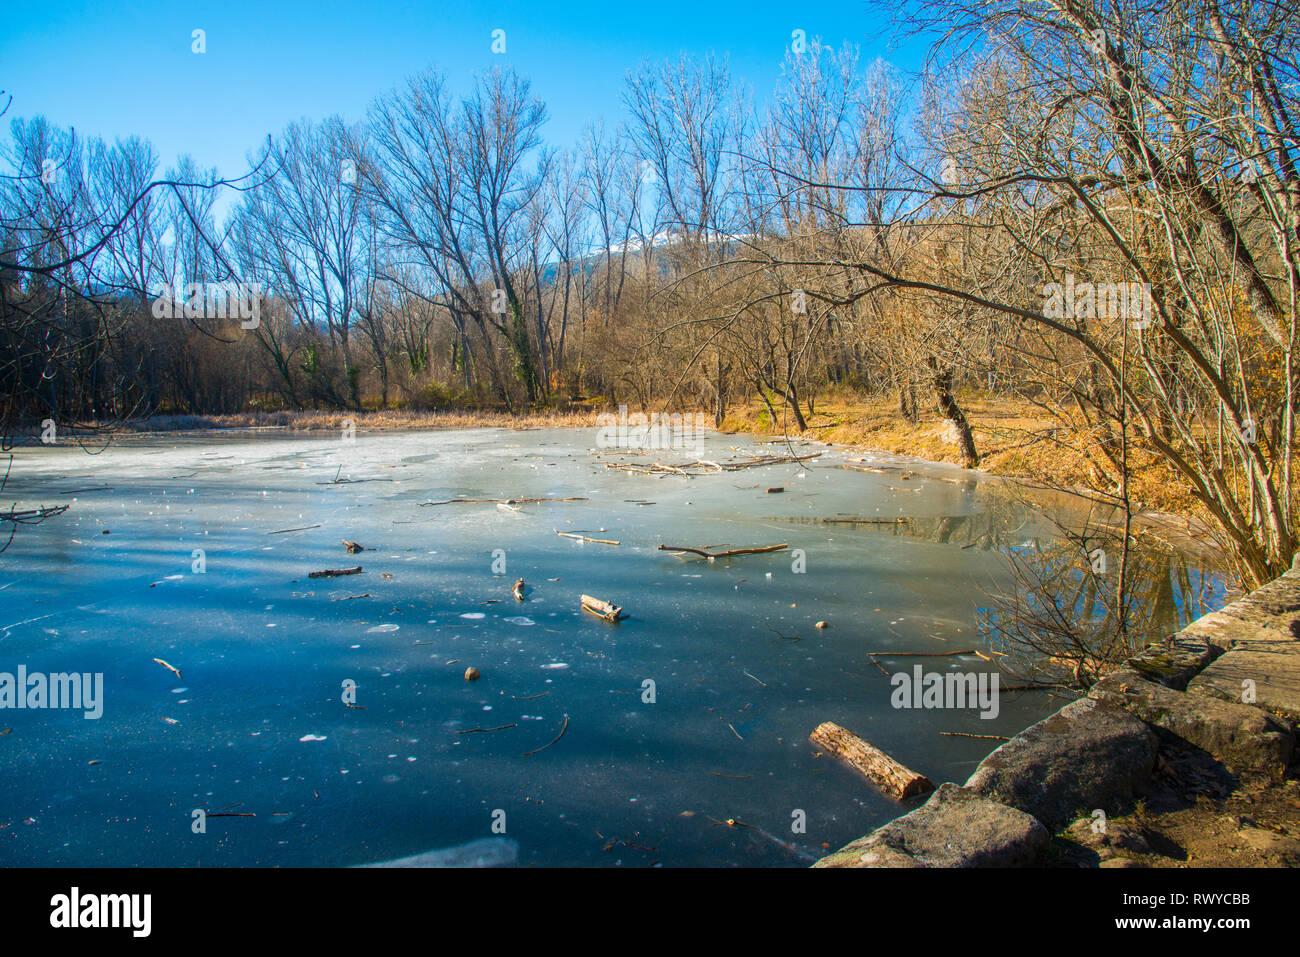 Frozen pond. Finnish Forest, Rascafria, Madrid province, Spain. - Stock Image